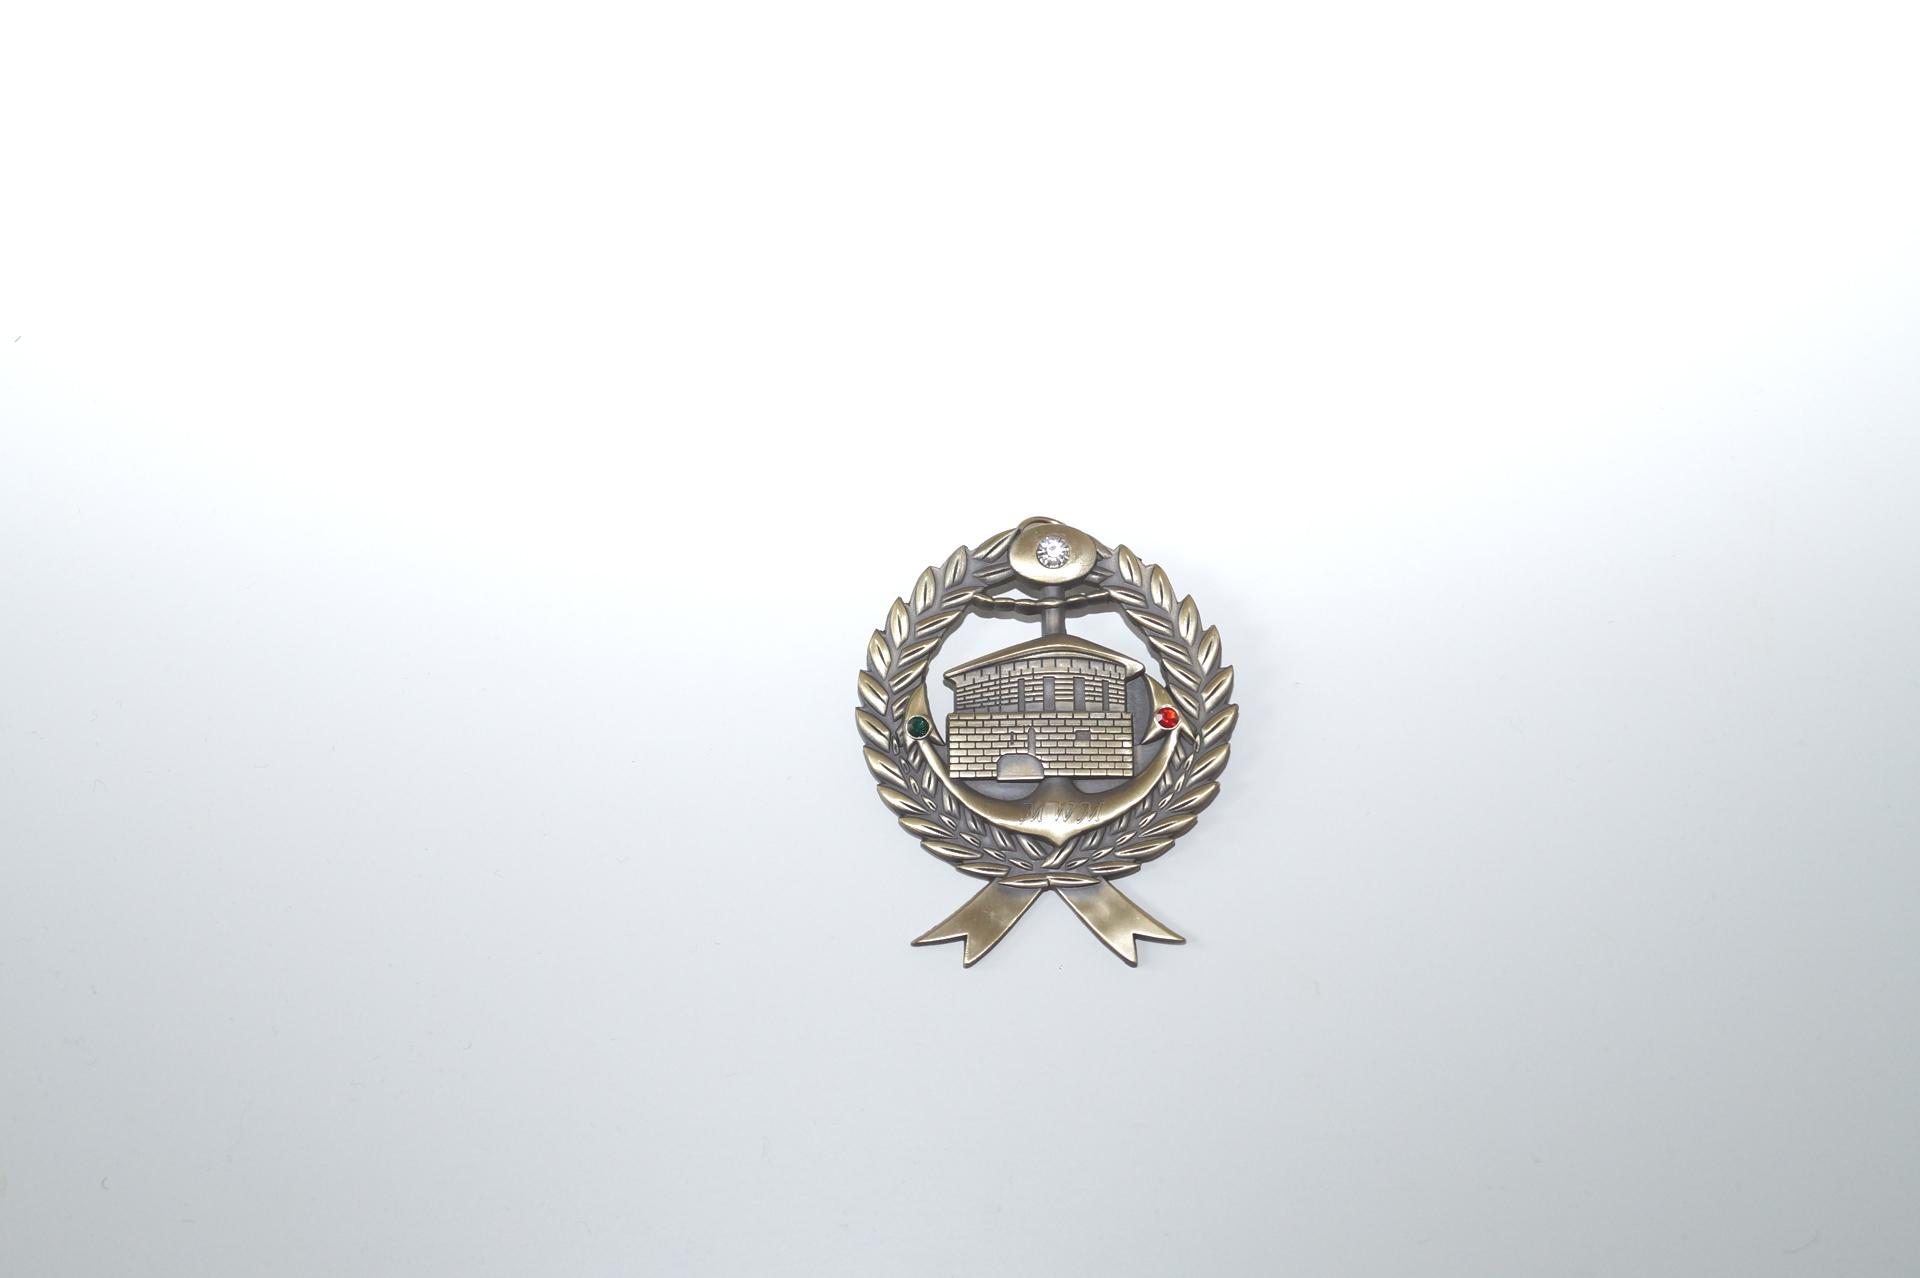 Komitee Orden